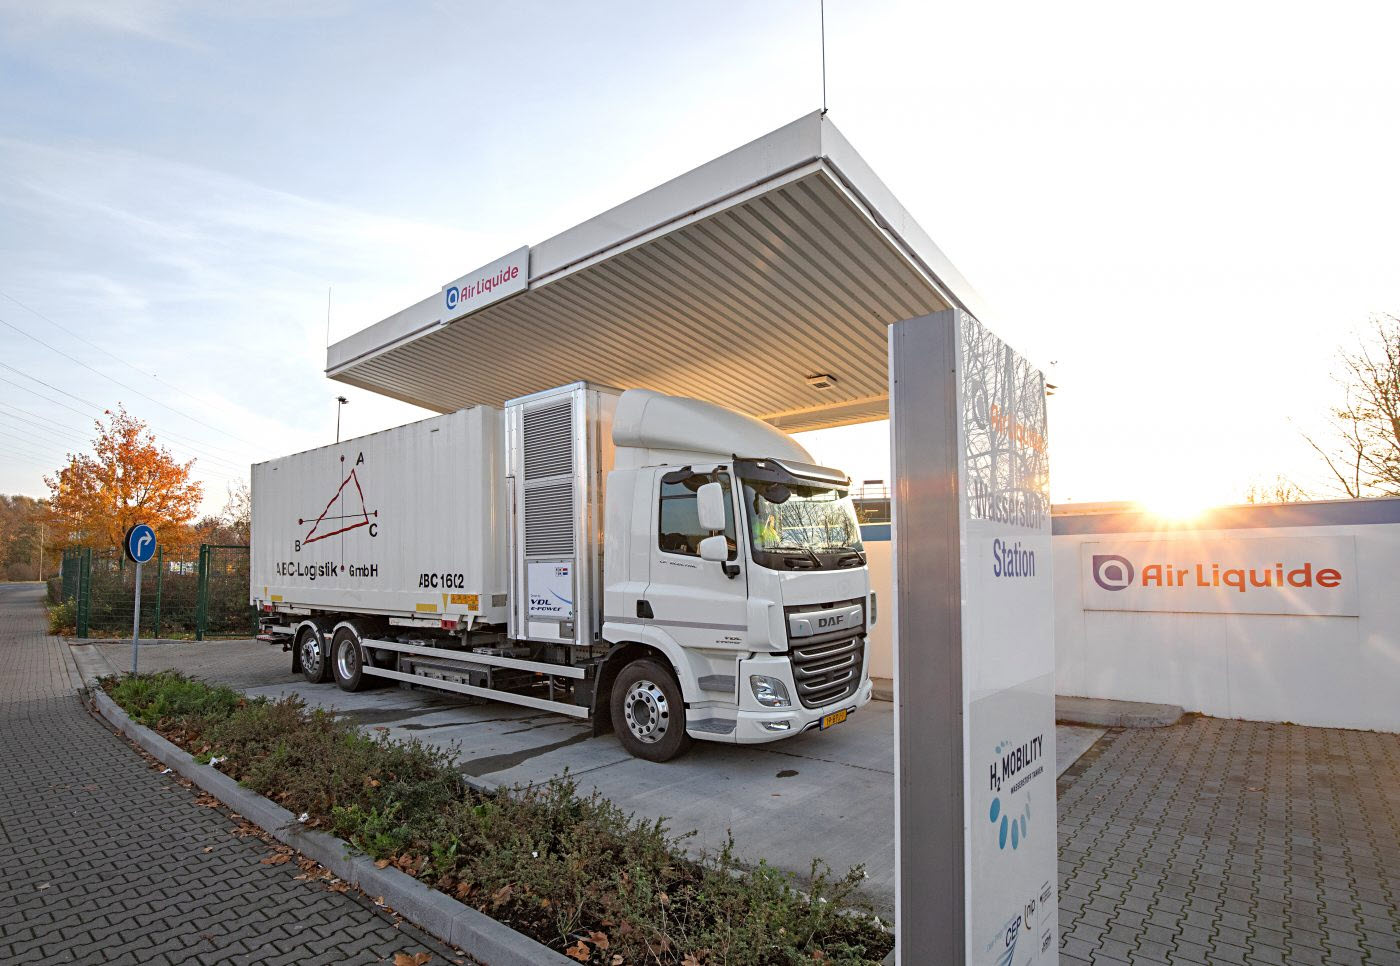 fuelcellsworks, ABC Logistik Demonstration A Success In Düsseldorf: Hydrogen Fuel Cell Truck Well Received